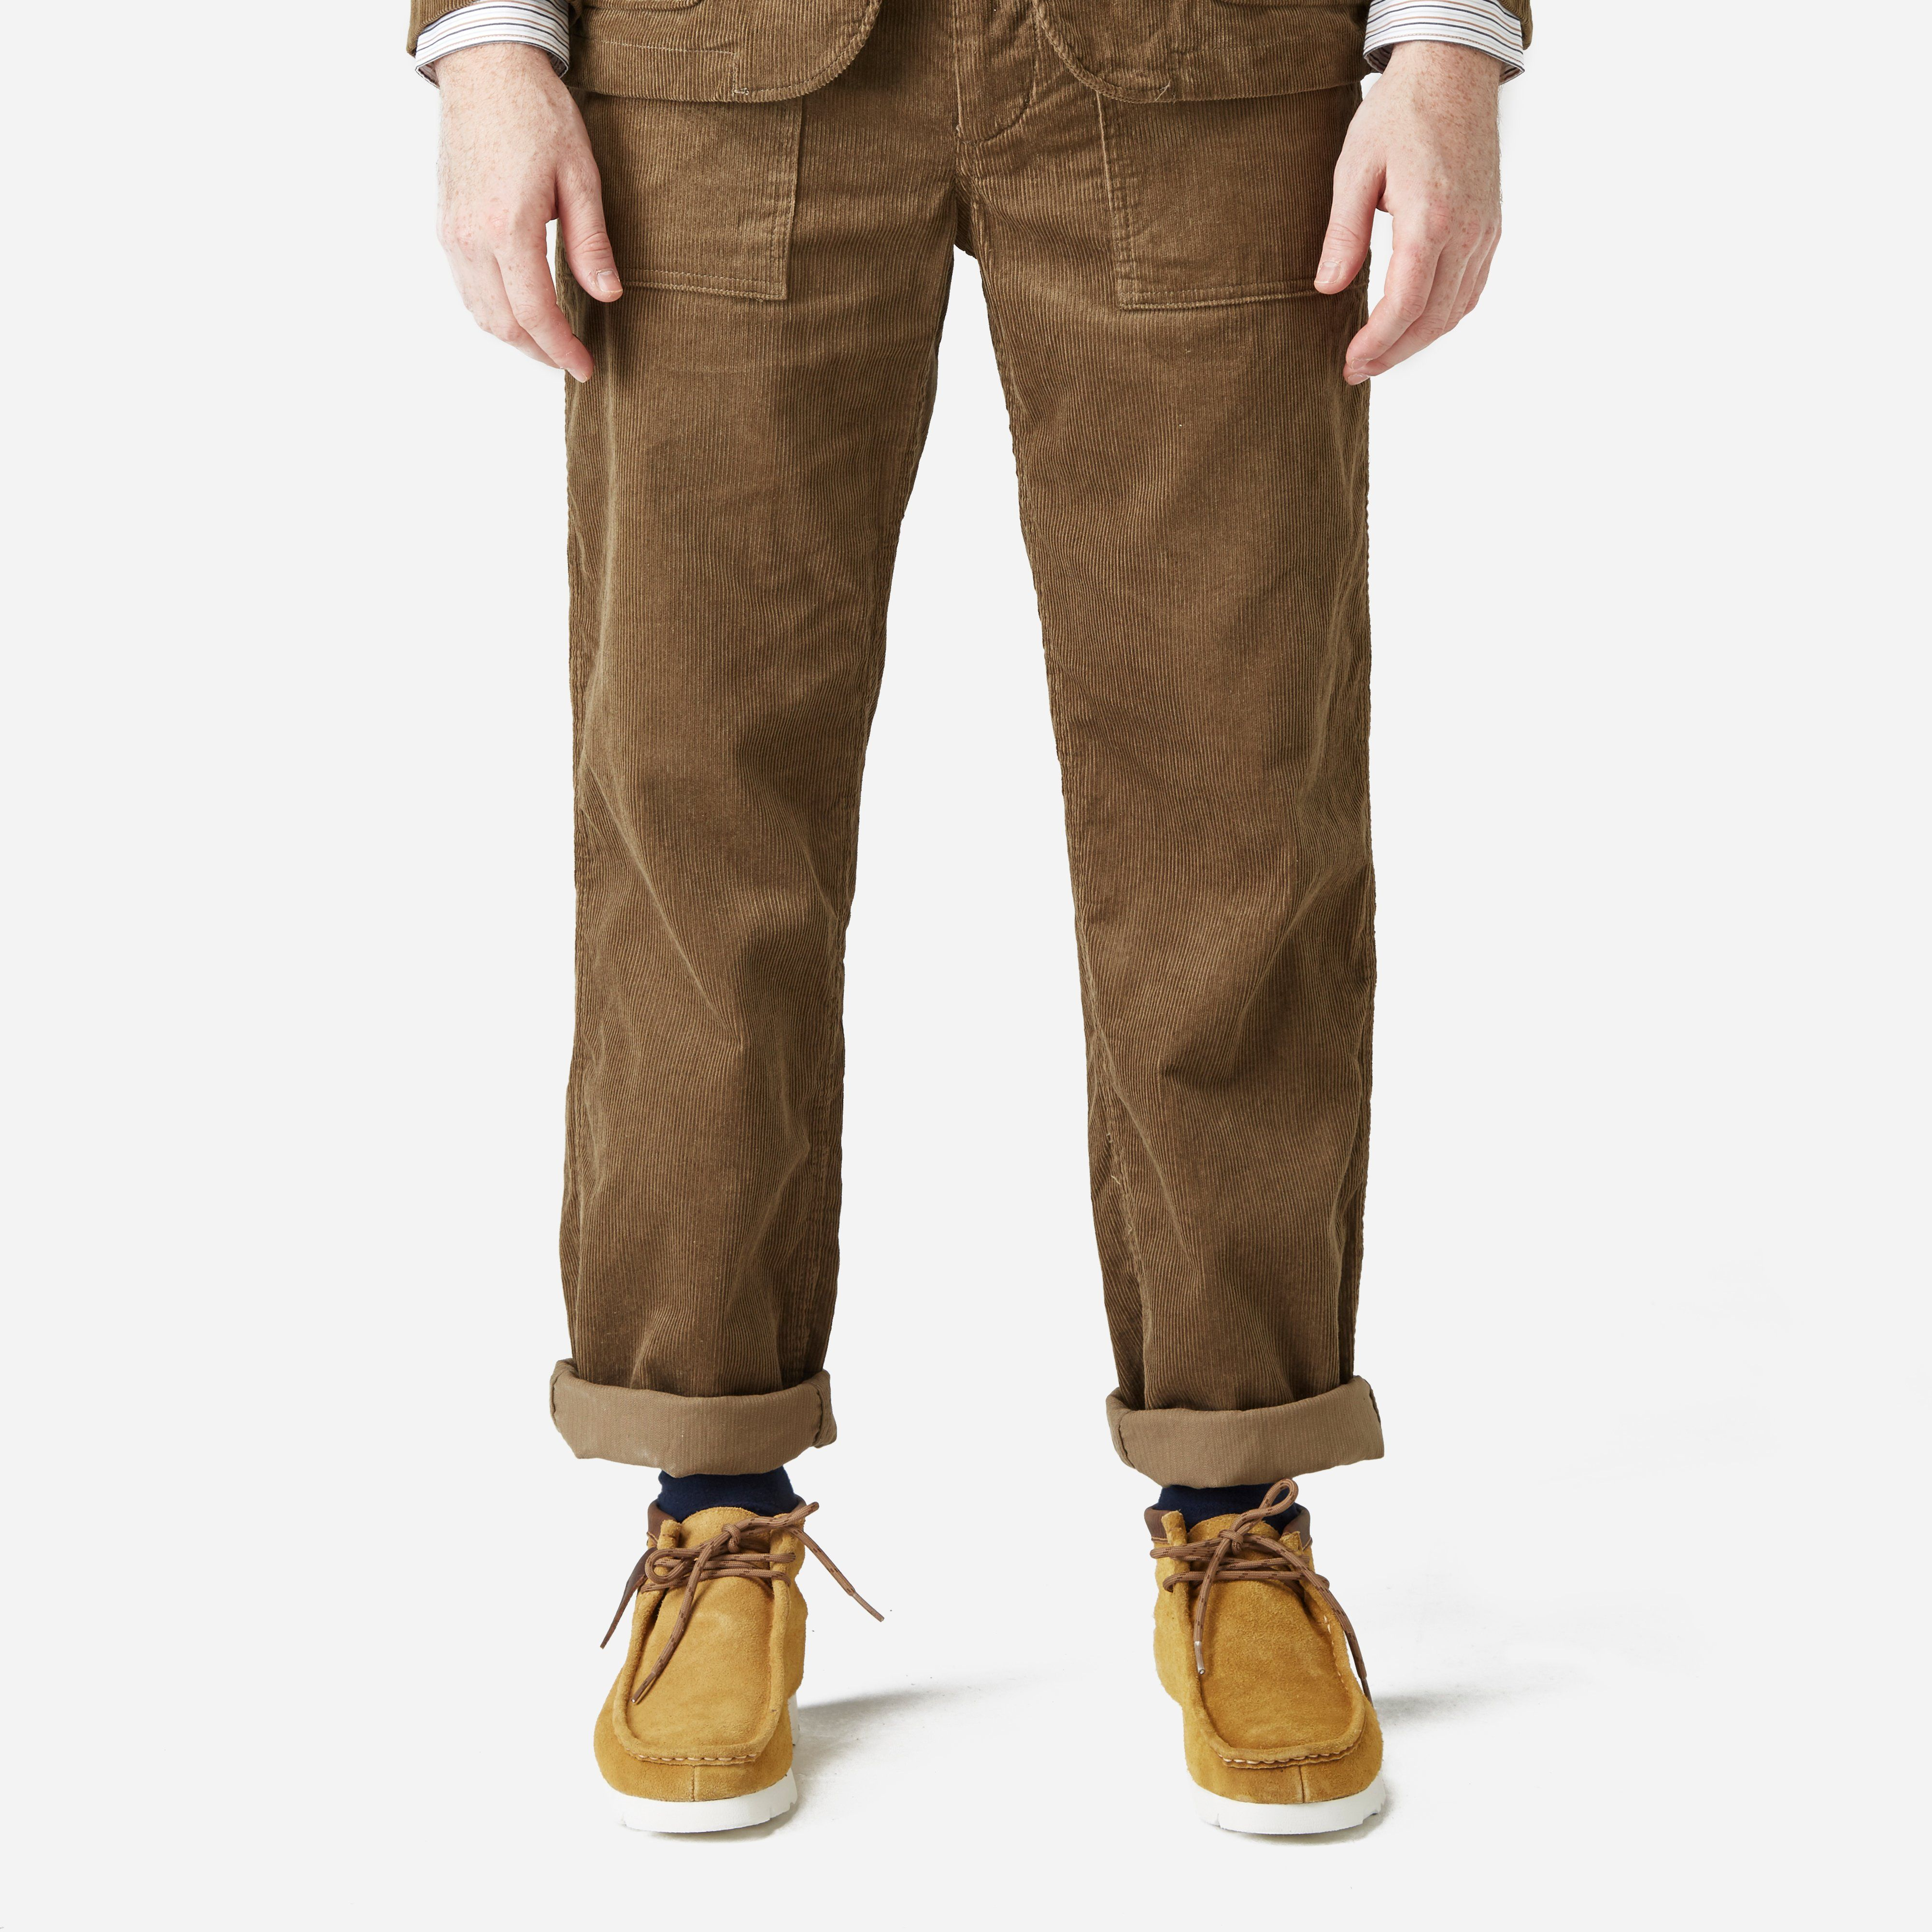 Engineered Garments Fatigue Pant - 11W Corduroy